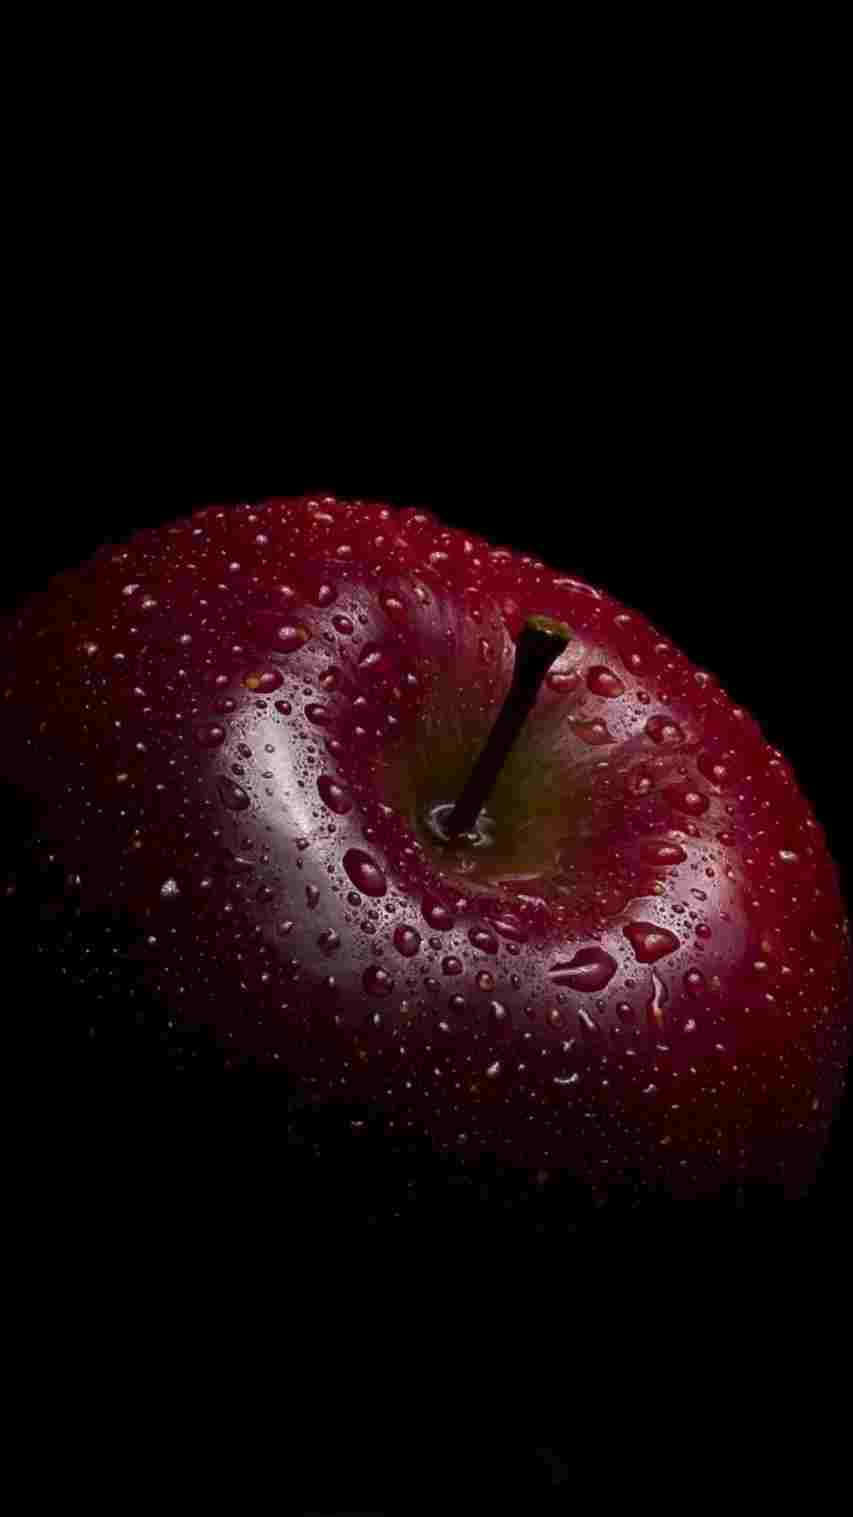 Download - Apple Fruit Wallpaper Hd ...